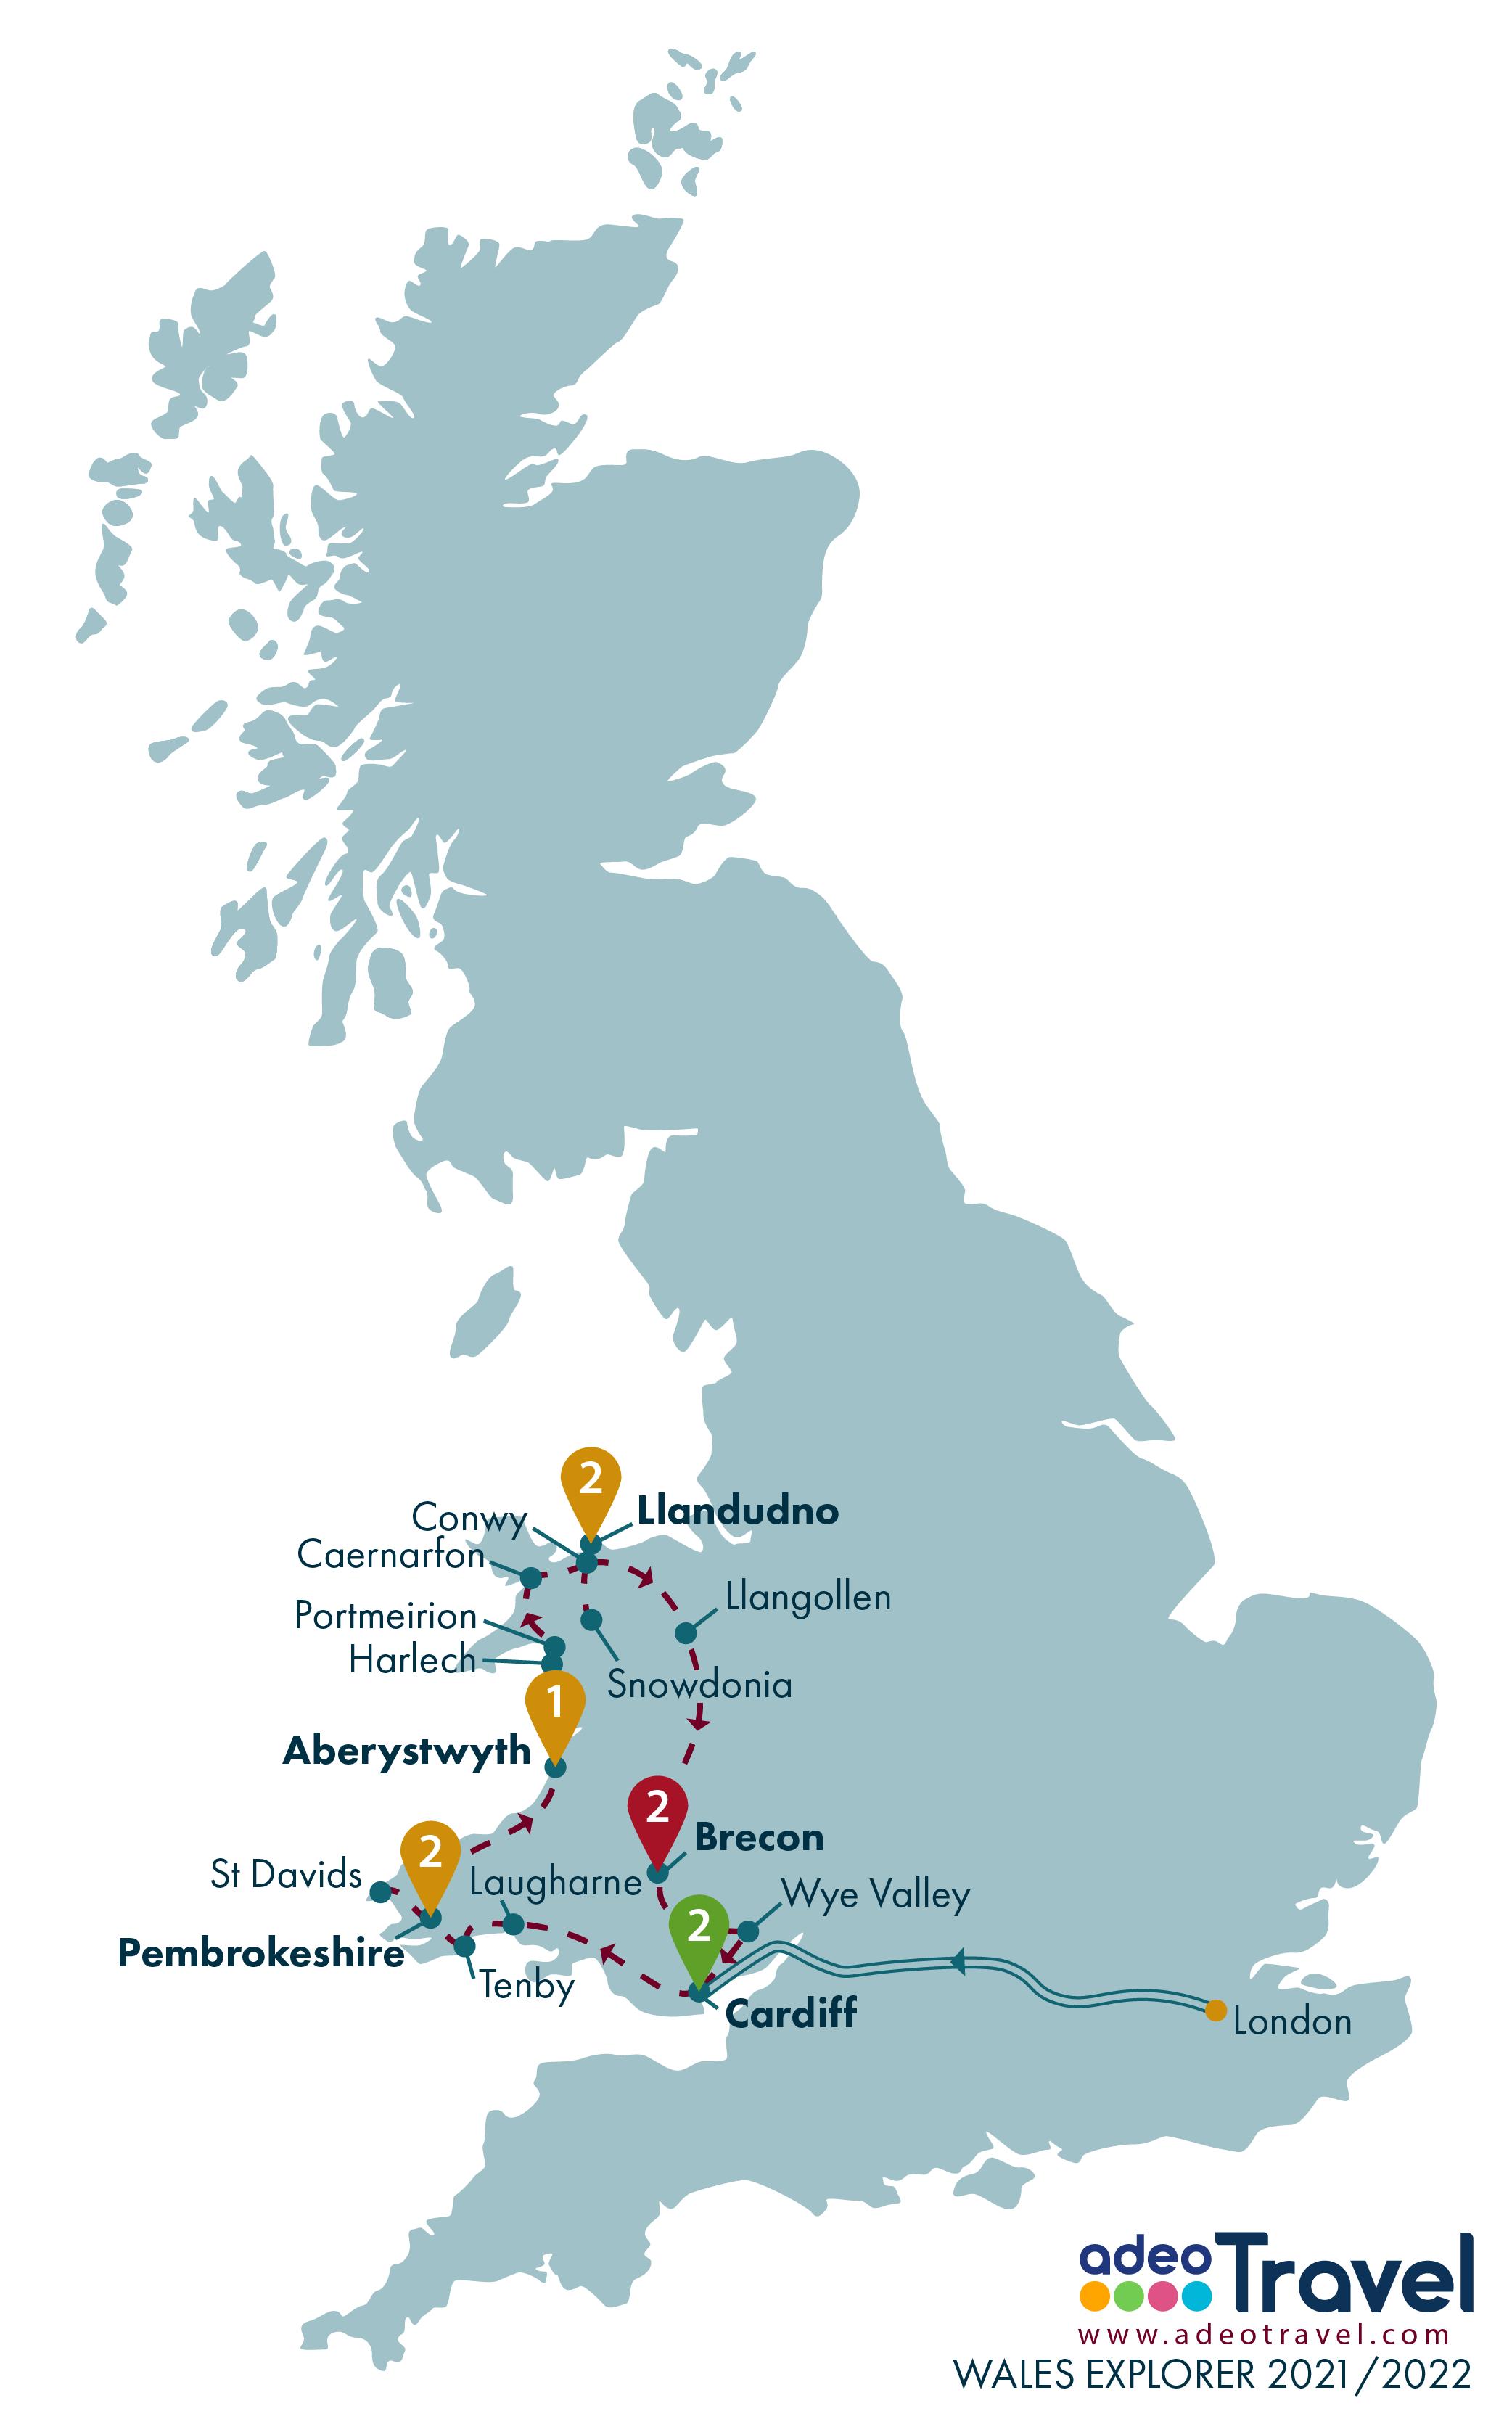 Map - Wales Explorer 2021 2022